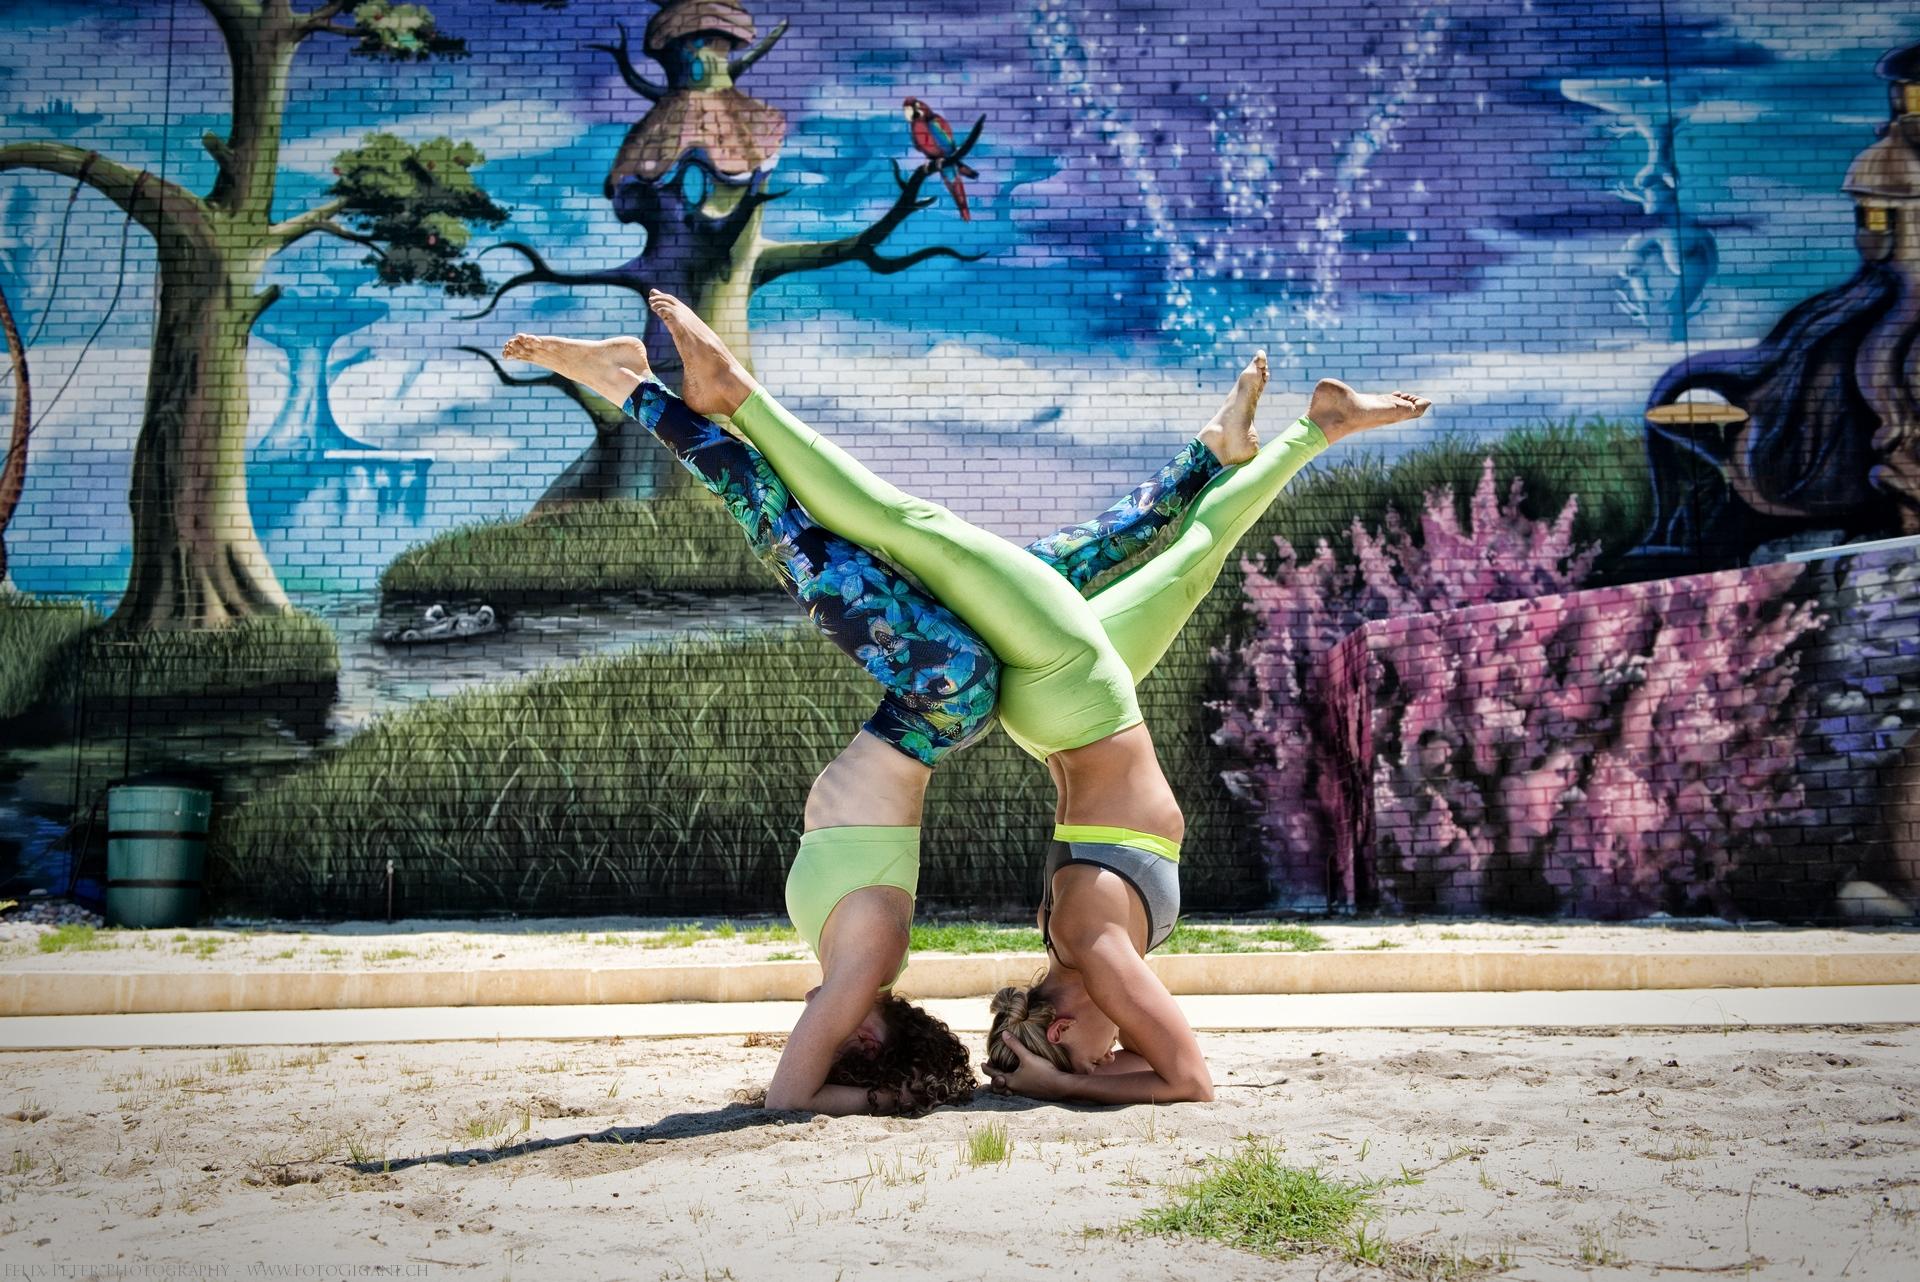 Felix-Peter-Yoga-Pilates-Dance-Fotografie_Bern_106.jpg